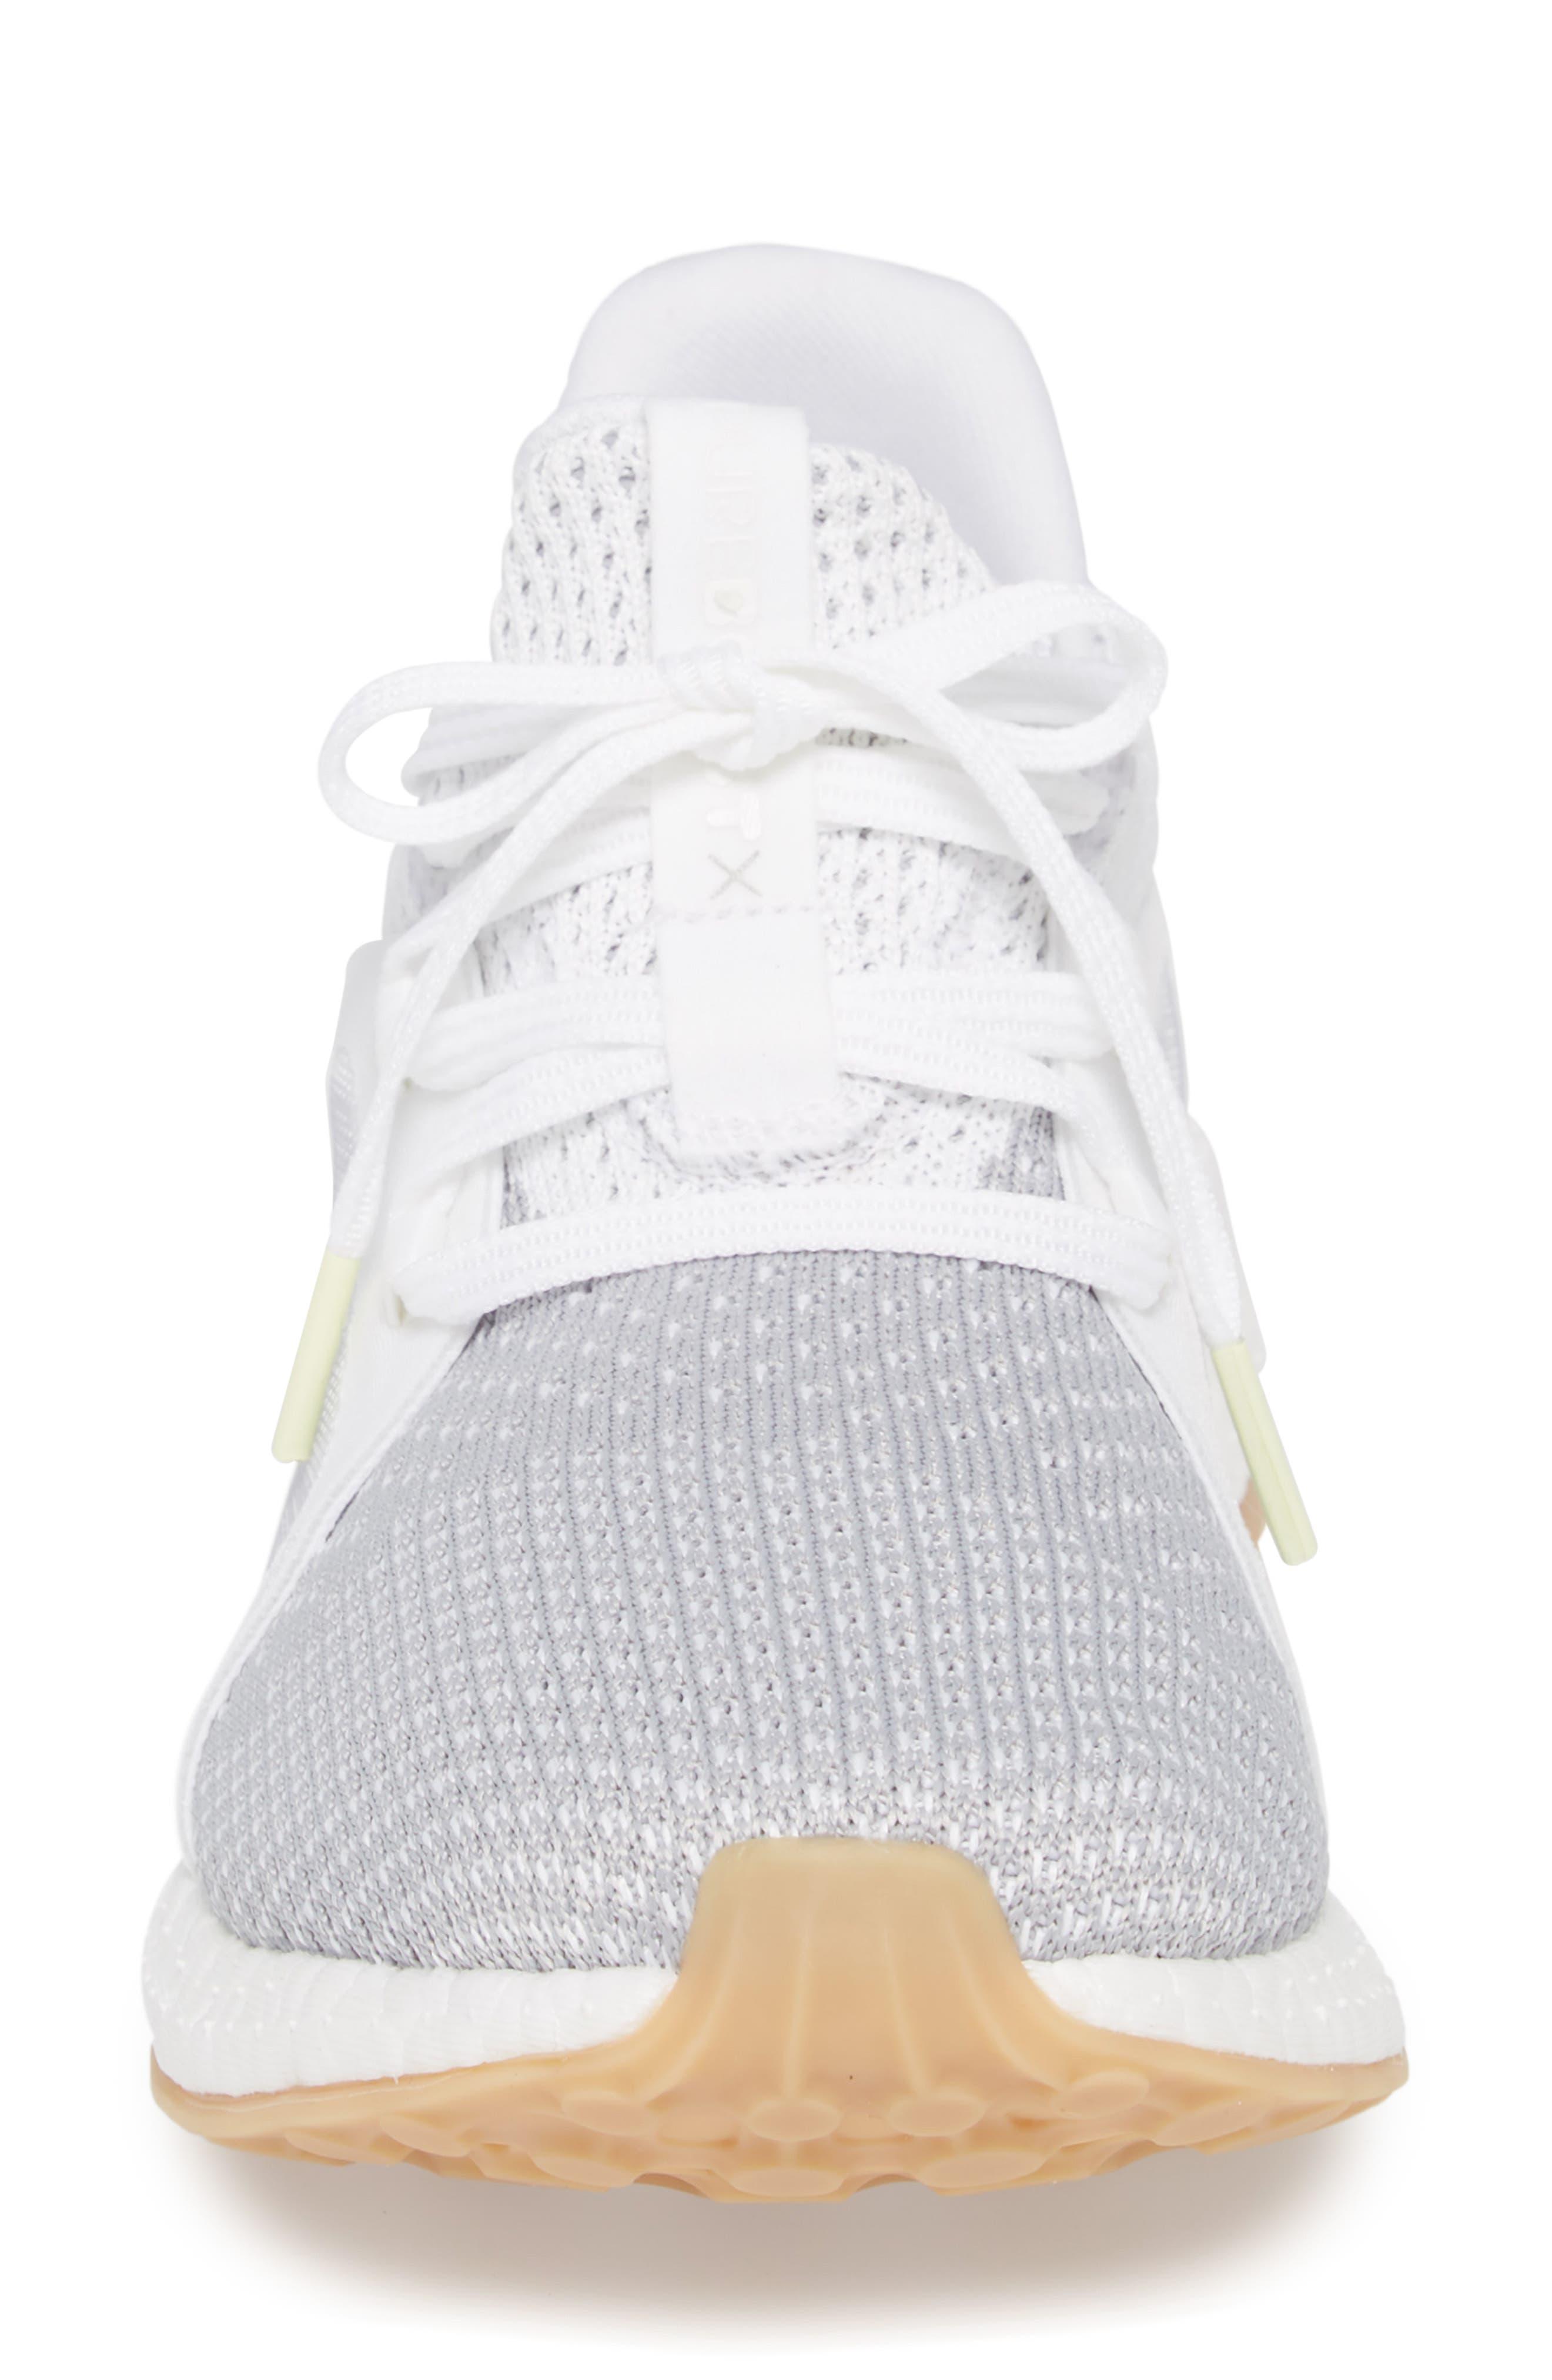 Pureboost X Clima Sneaker,                             Alternate thumbnail 4, color,                             White/ Silver/ Grey